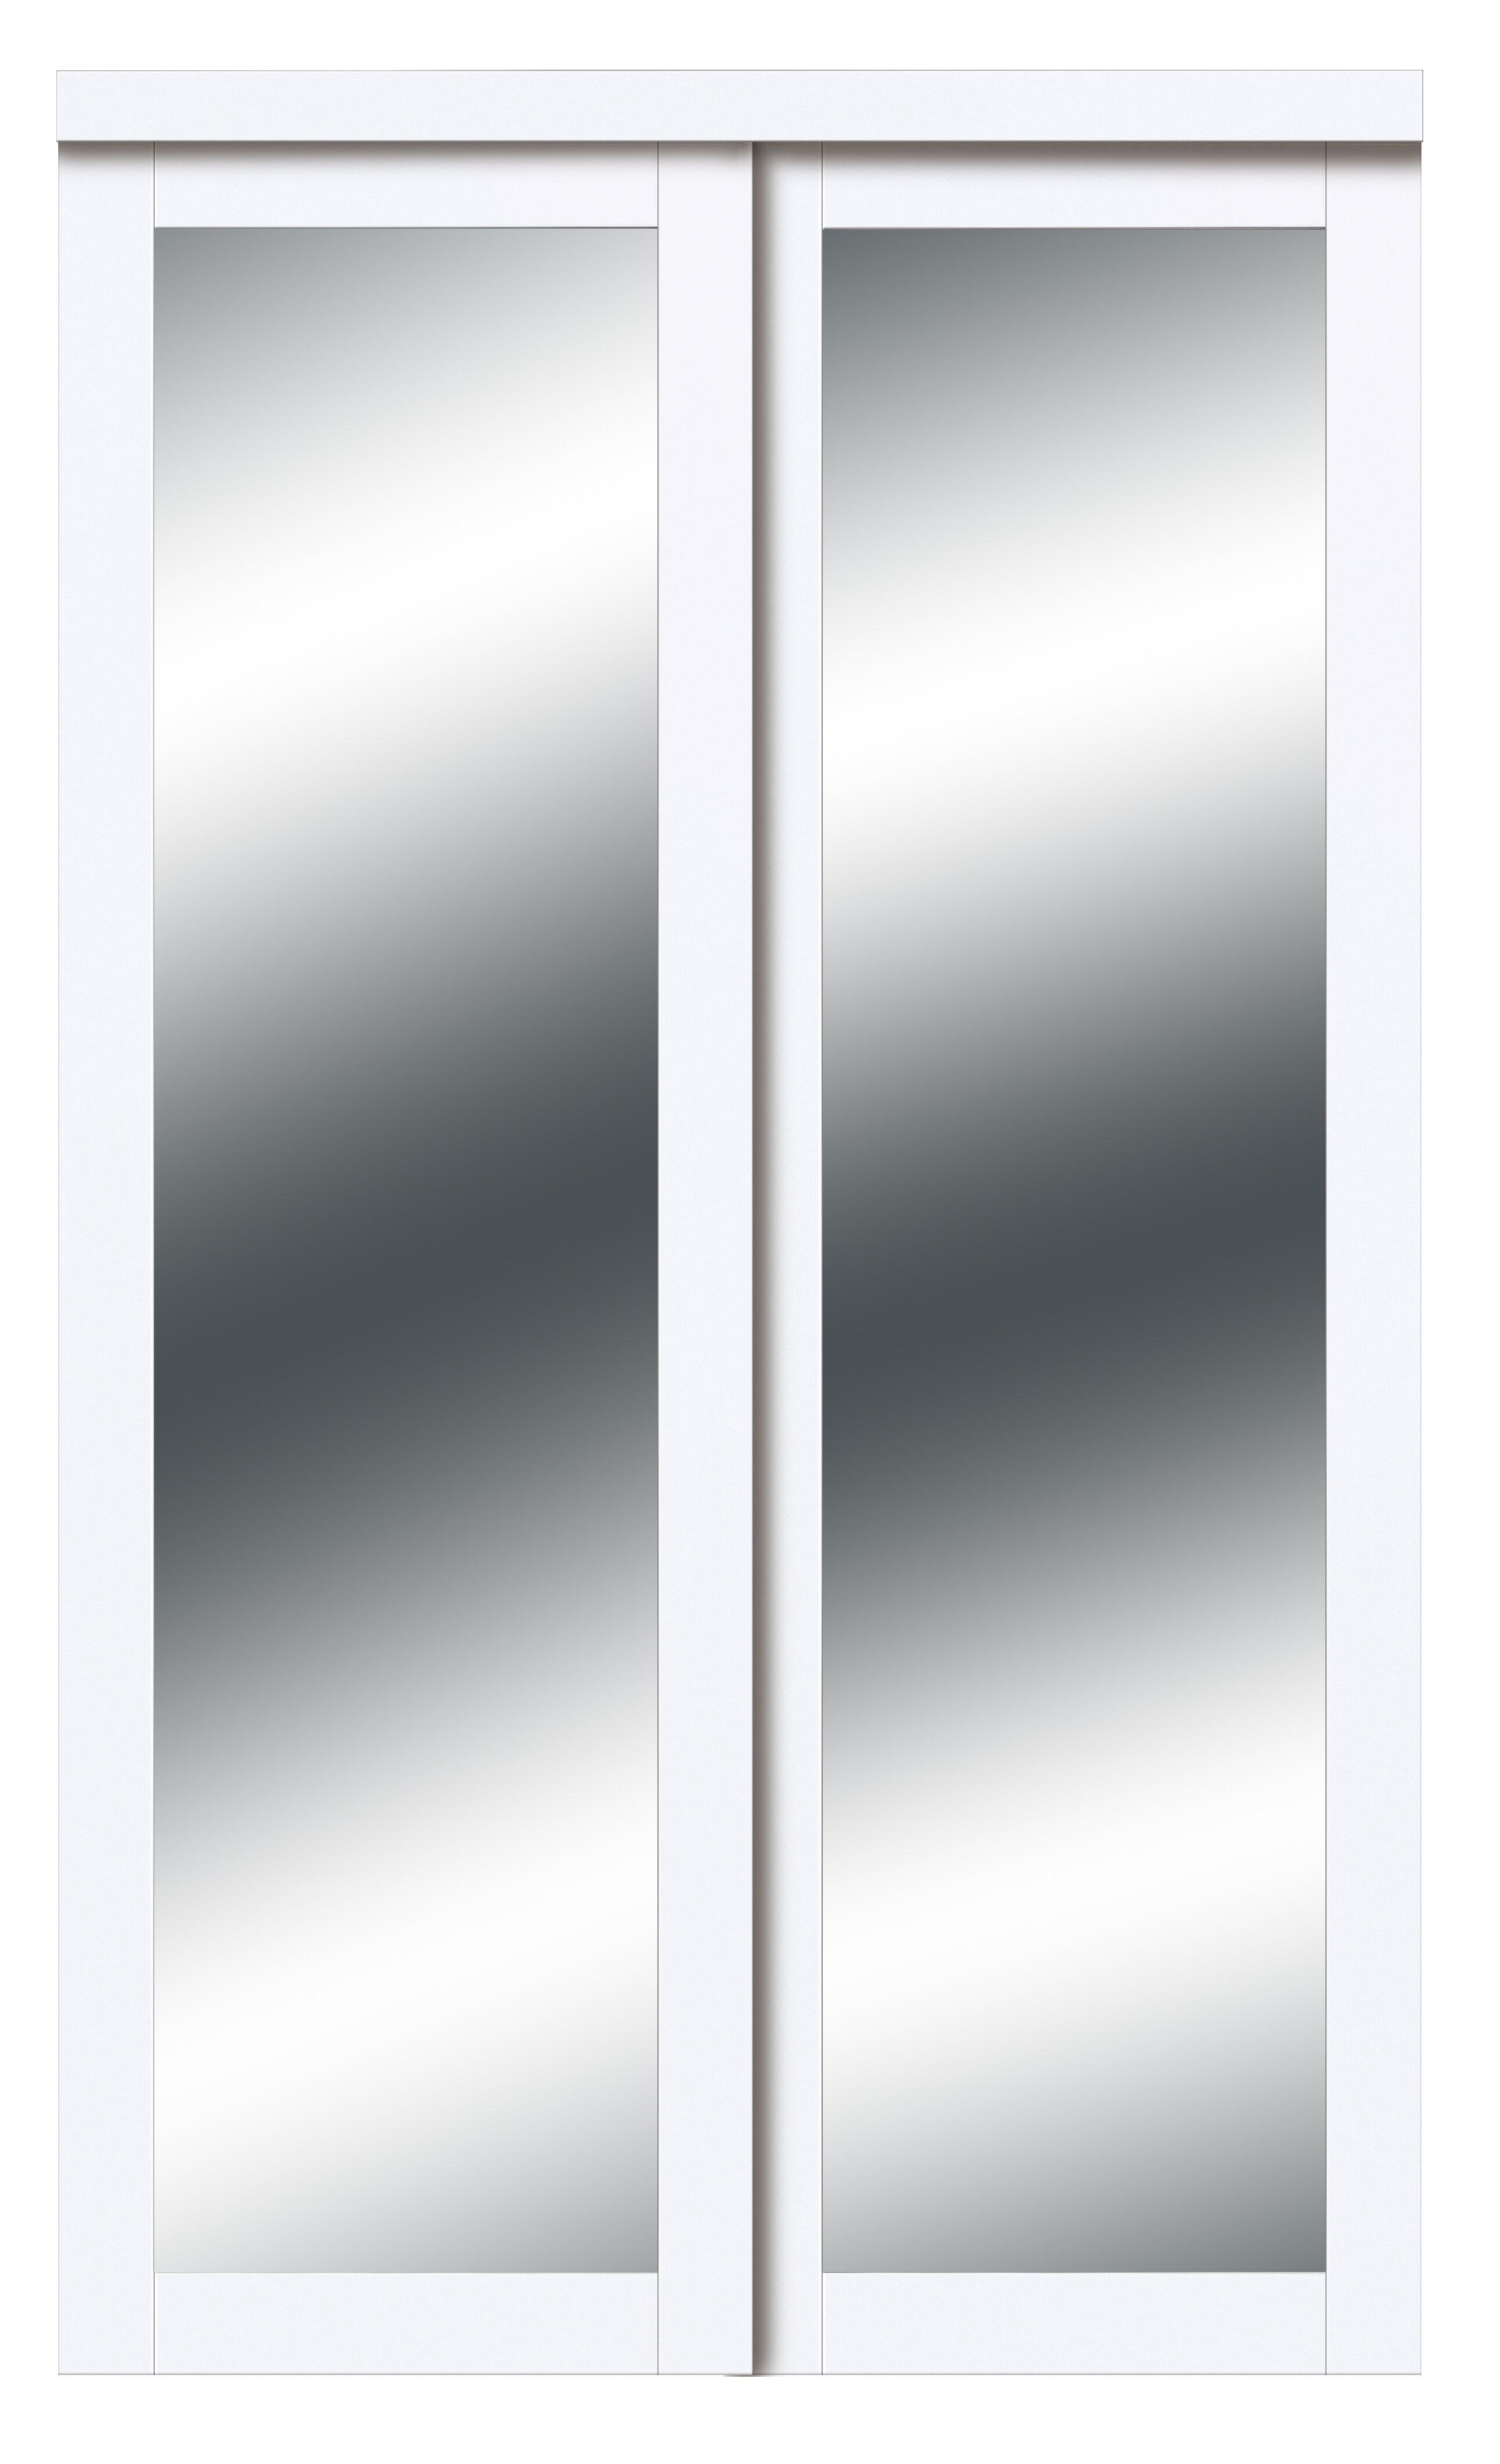 Renin Harmony Mirrored Sliding Closet Doors Reviews Wayfair Ca